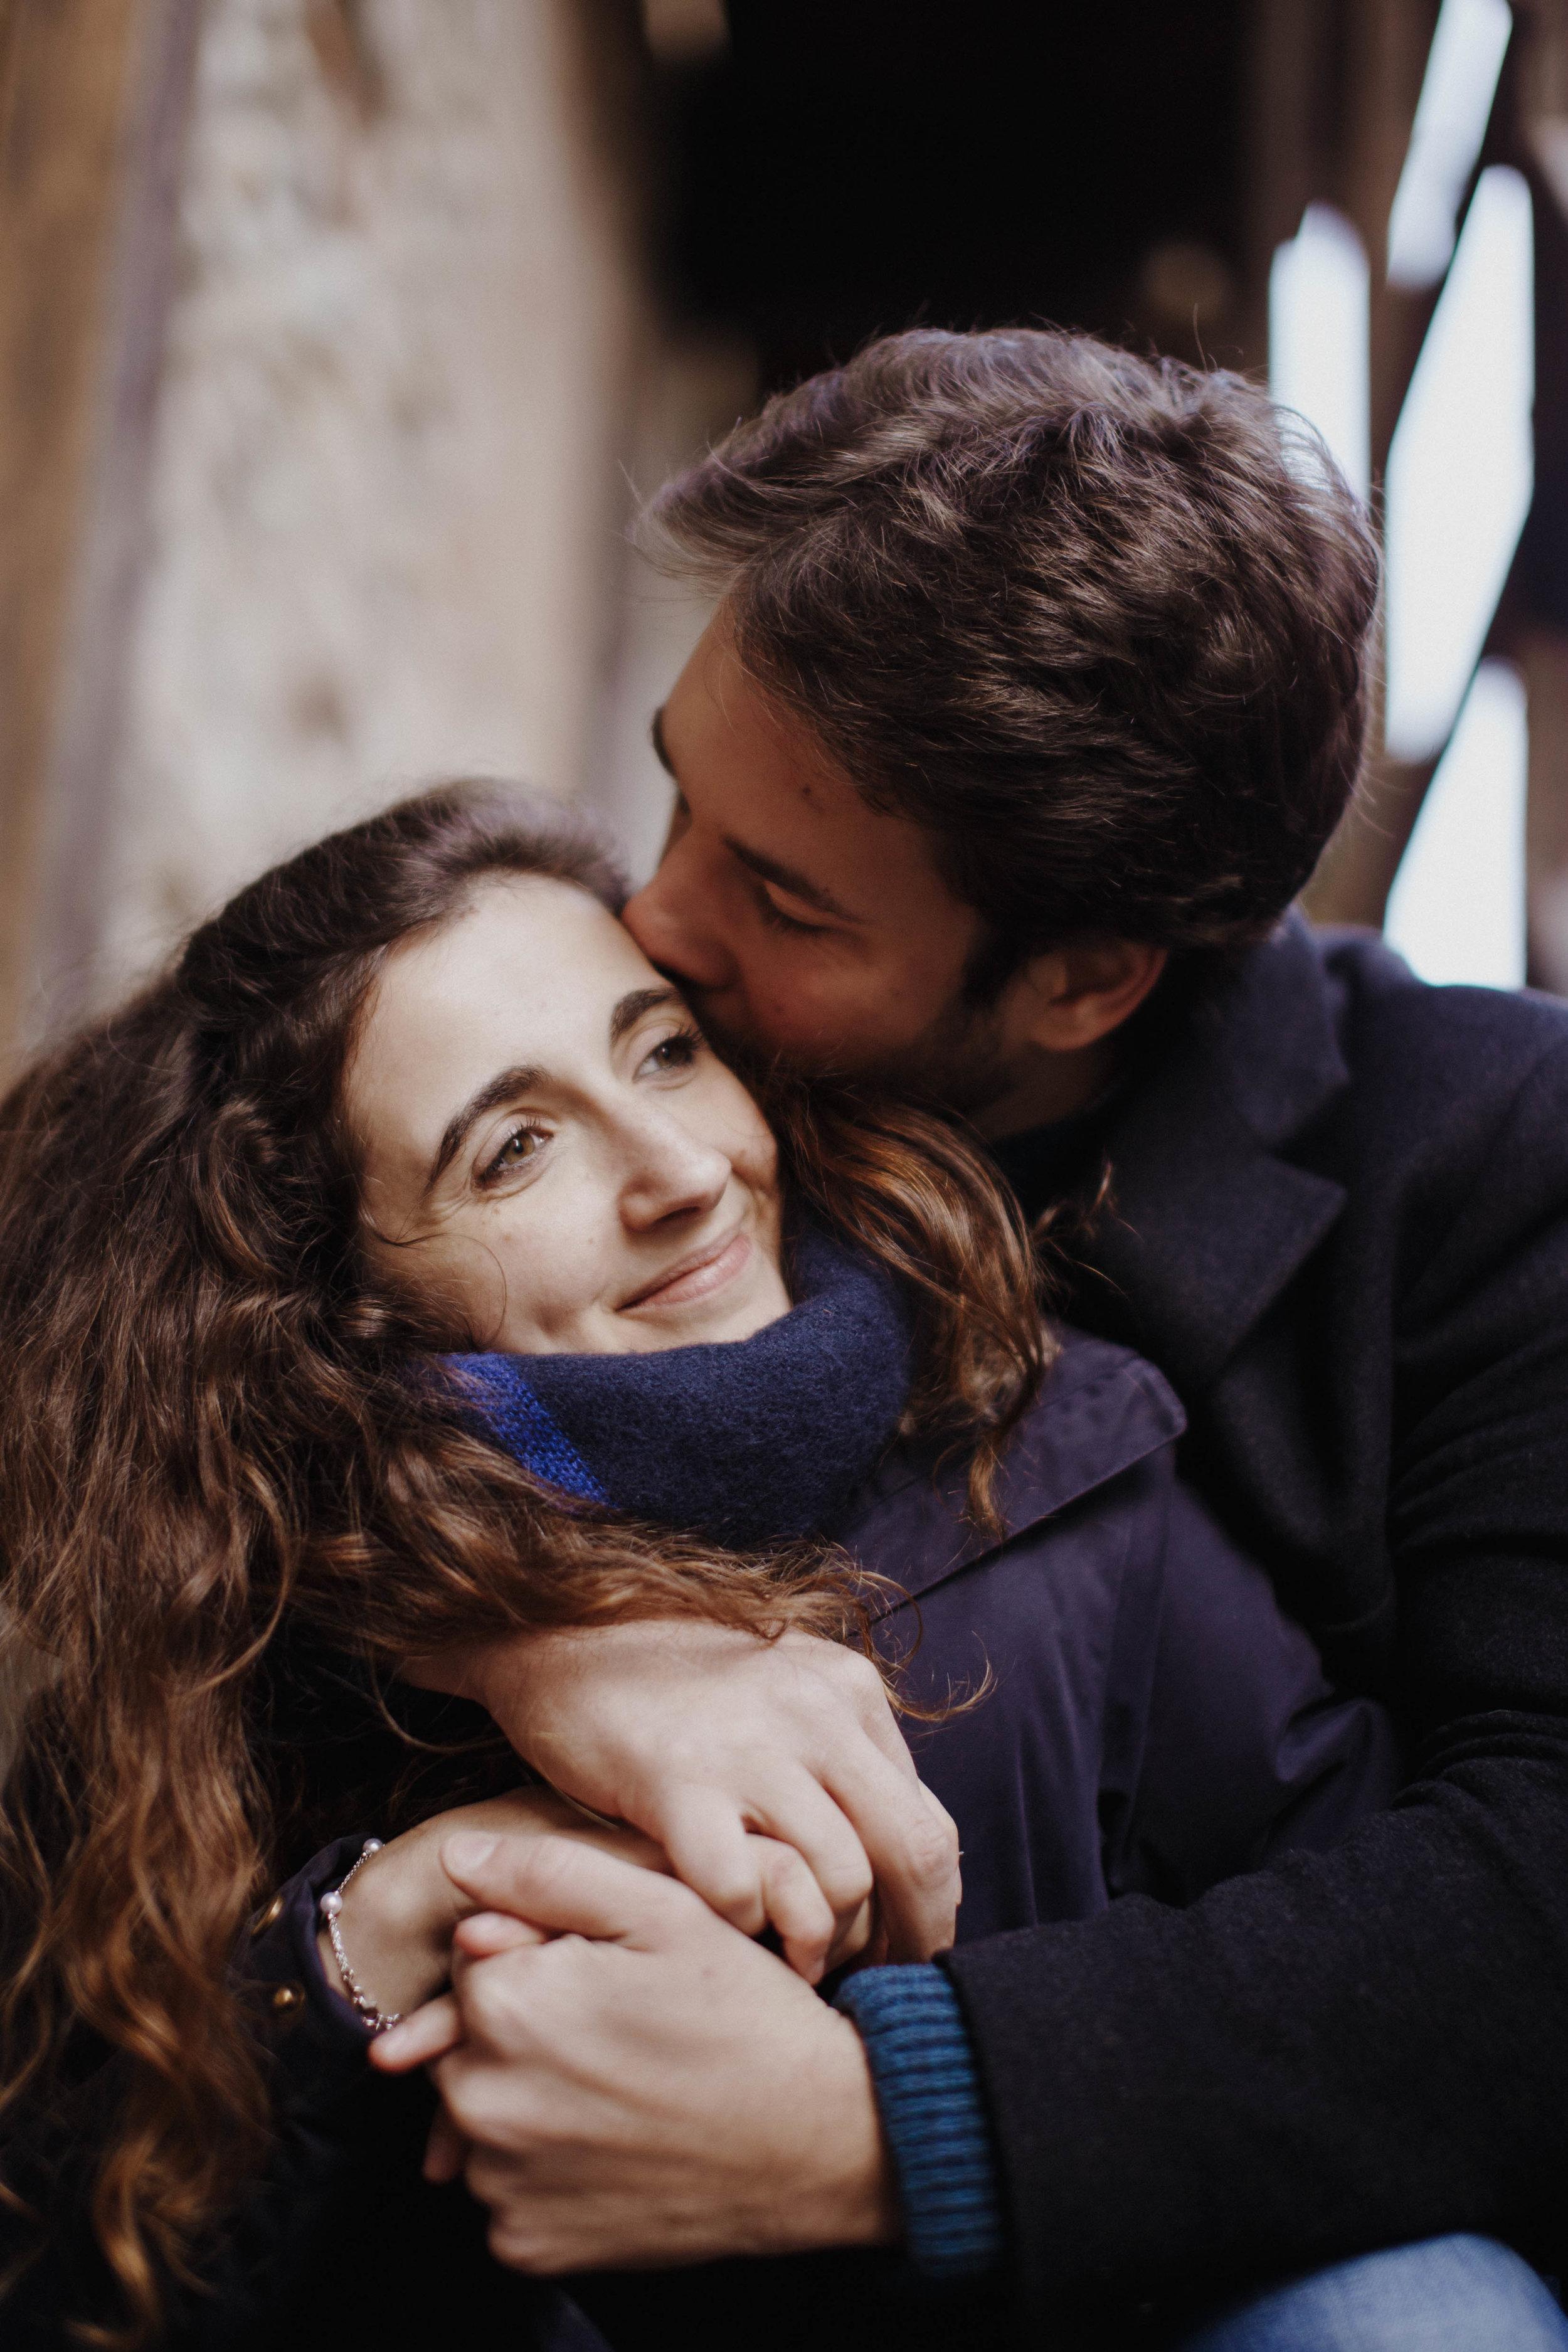 065 - Elisa + Riccardo - engagement.JPG